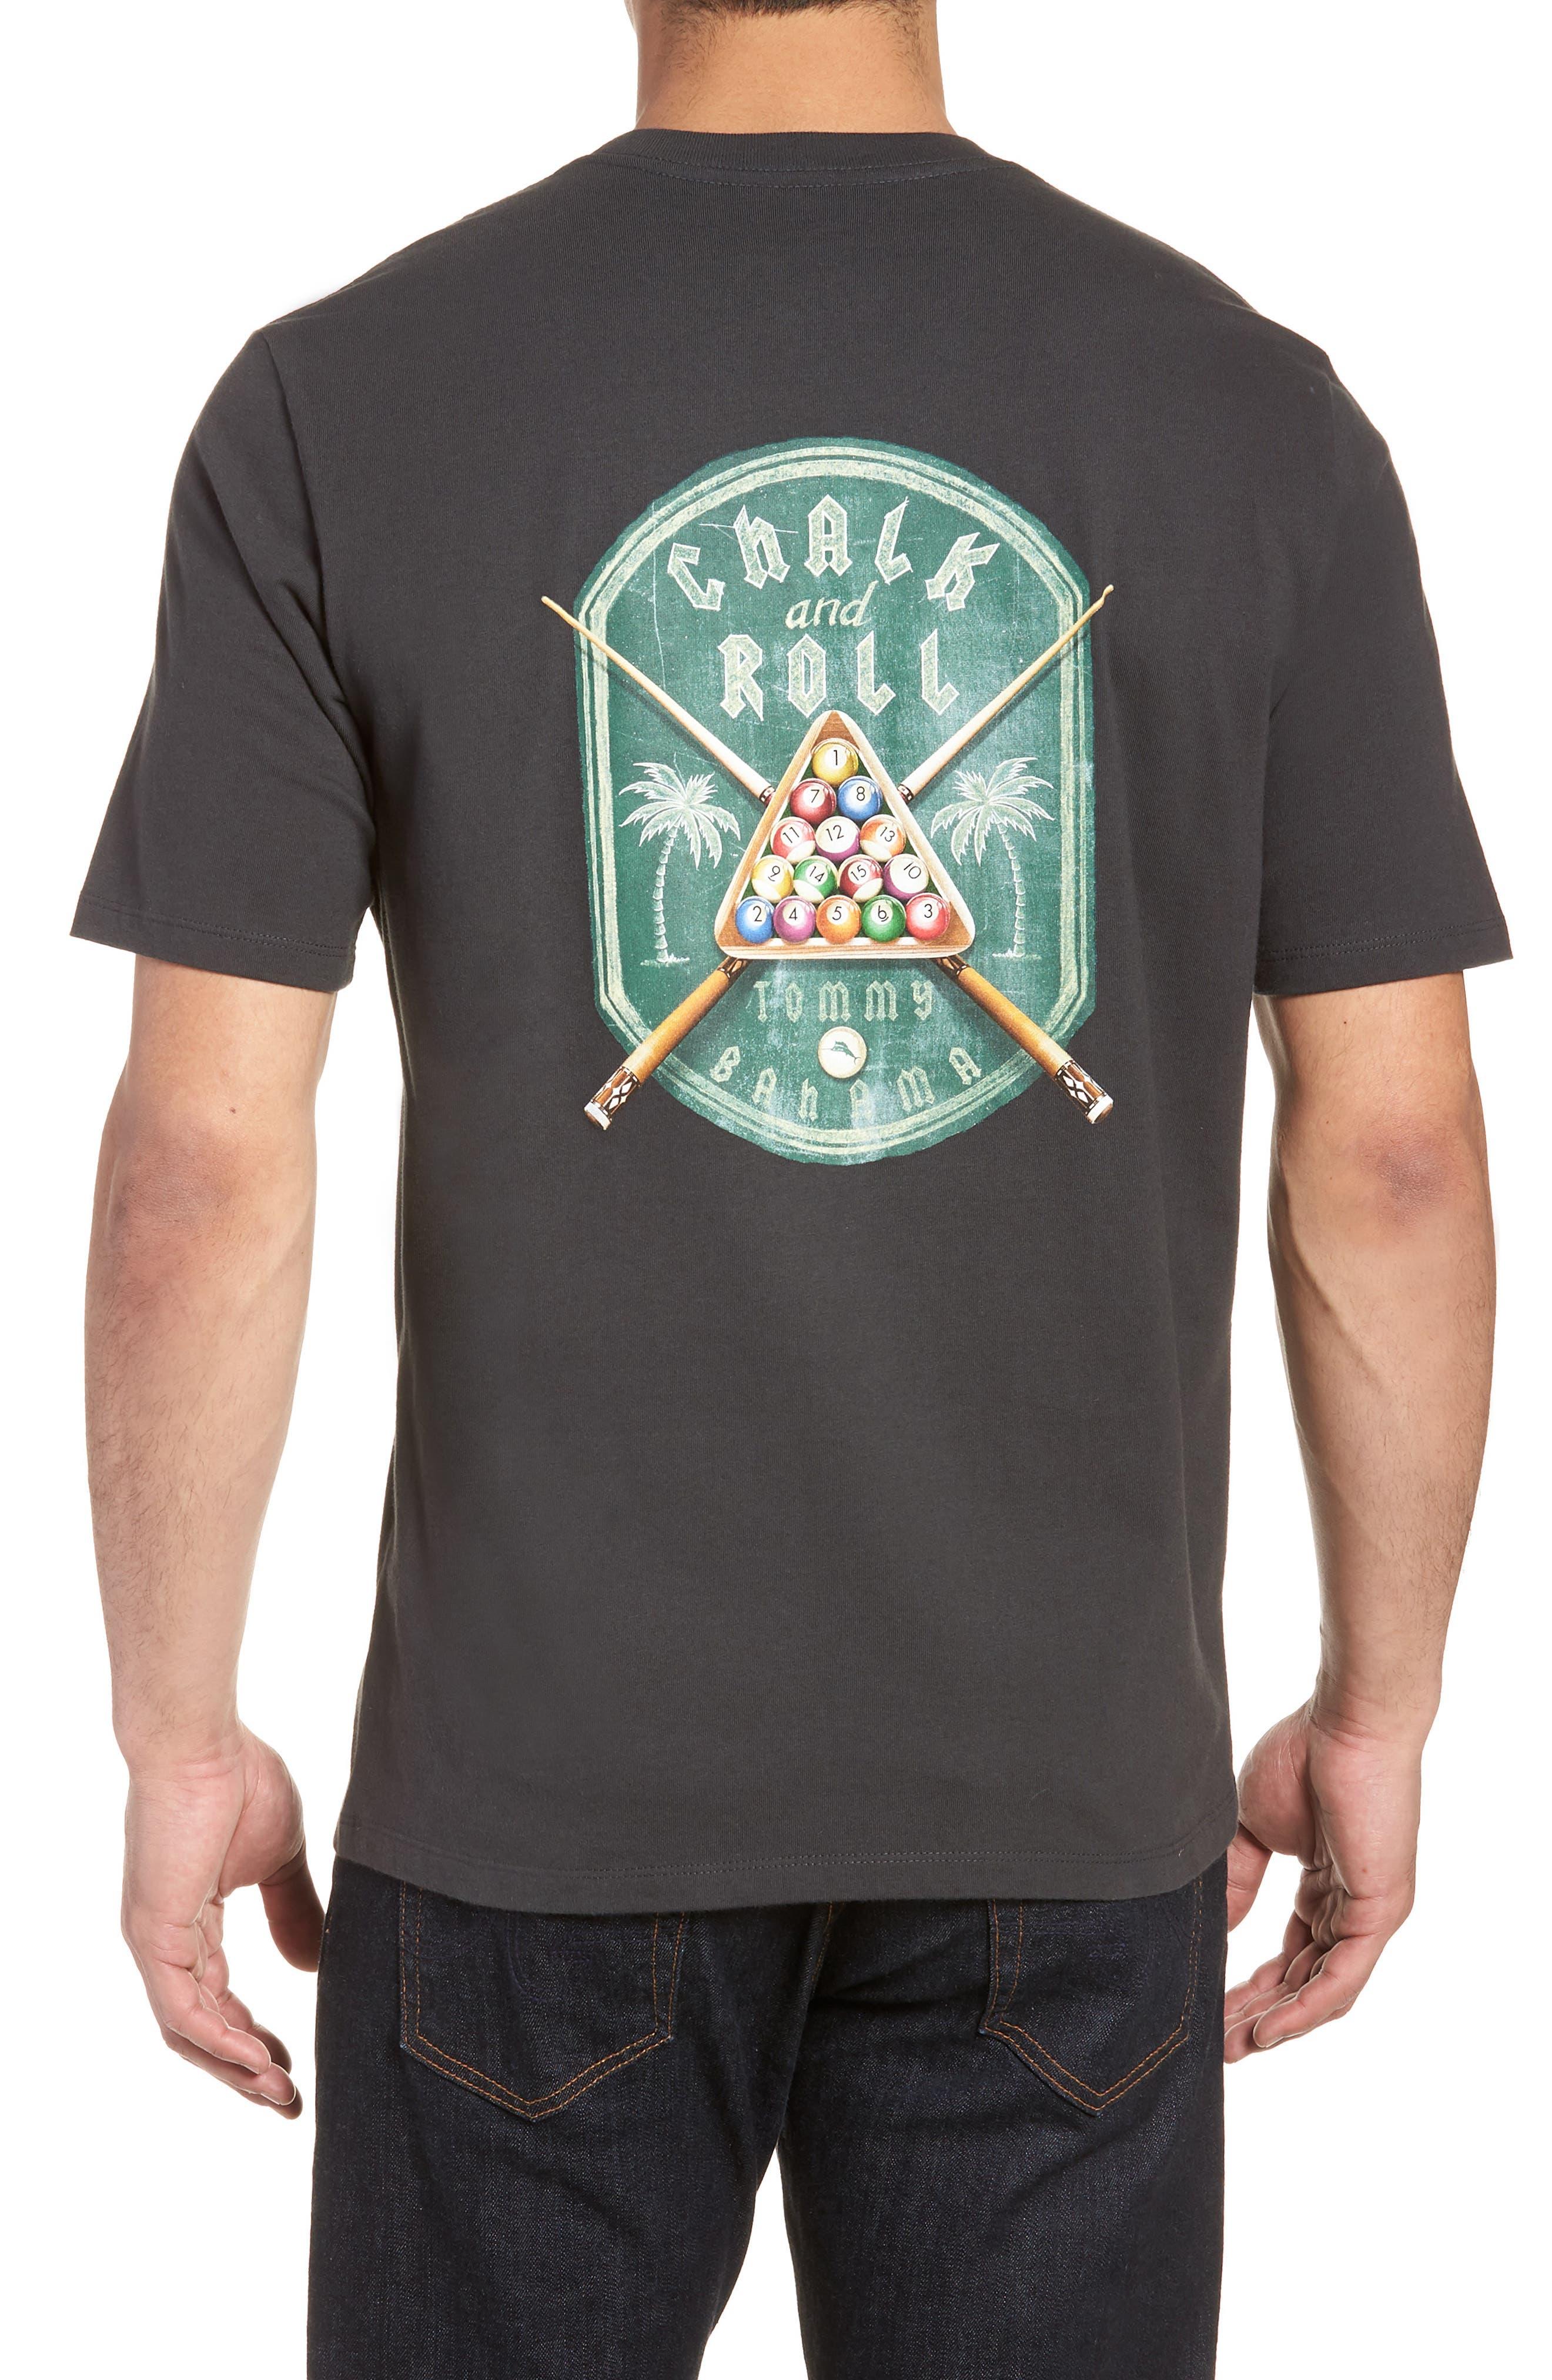 Chalk & Roll T-Shirt,                             Alternate thumbnail 2, color,                             001